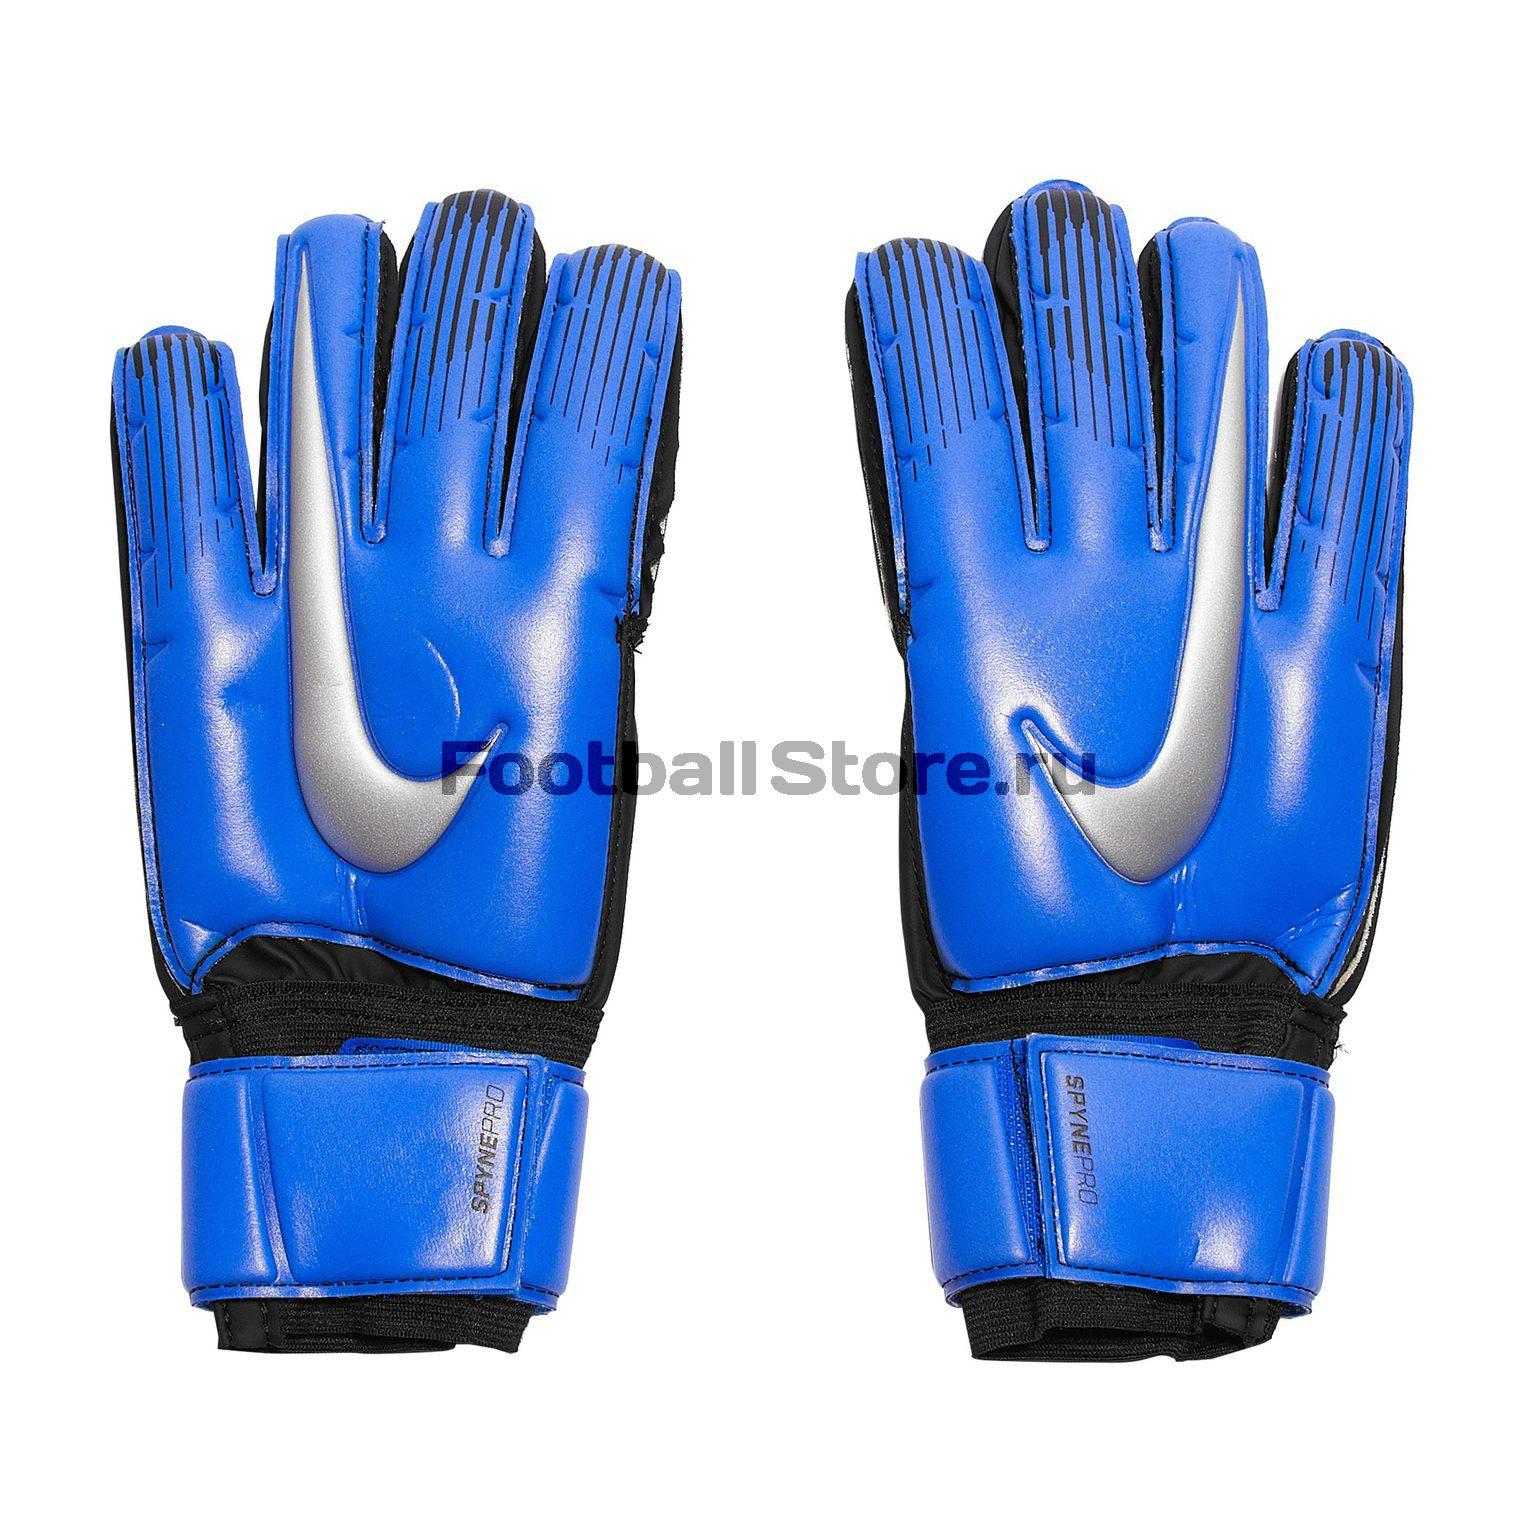 Перчатки вратарские Nike Spyne Pro GS0371-410 - купить в интернет магазине  Footballstore, цена, фото 6b25a9c99b3